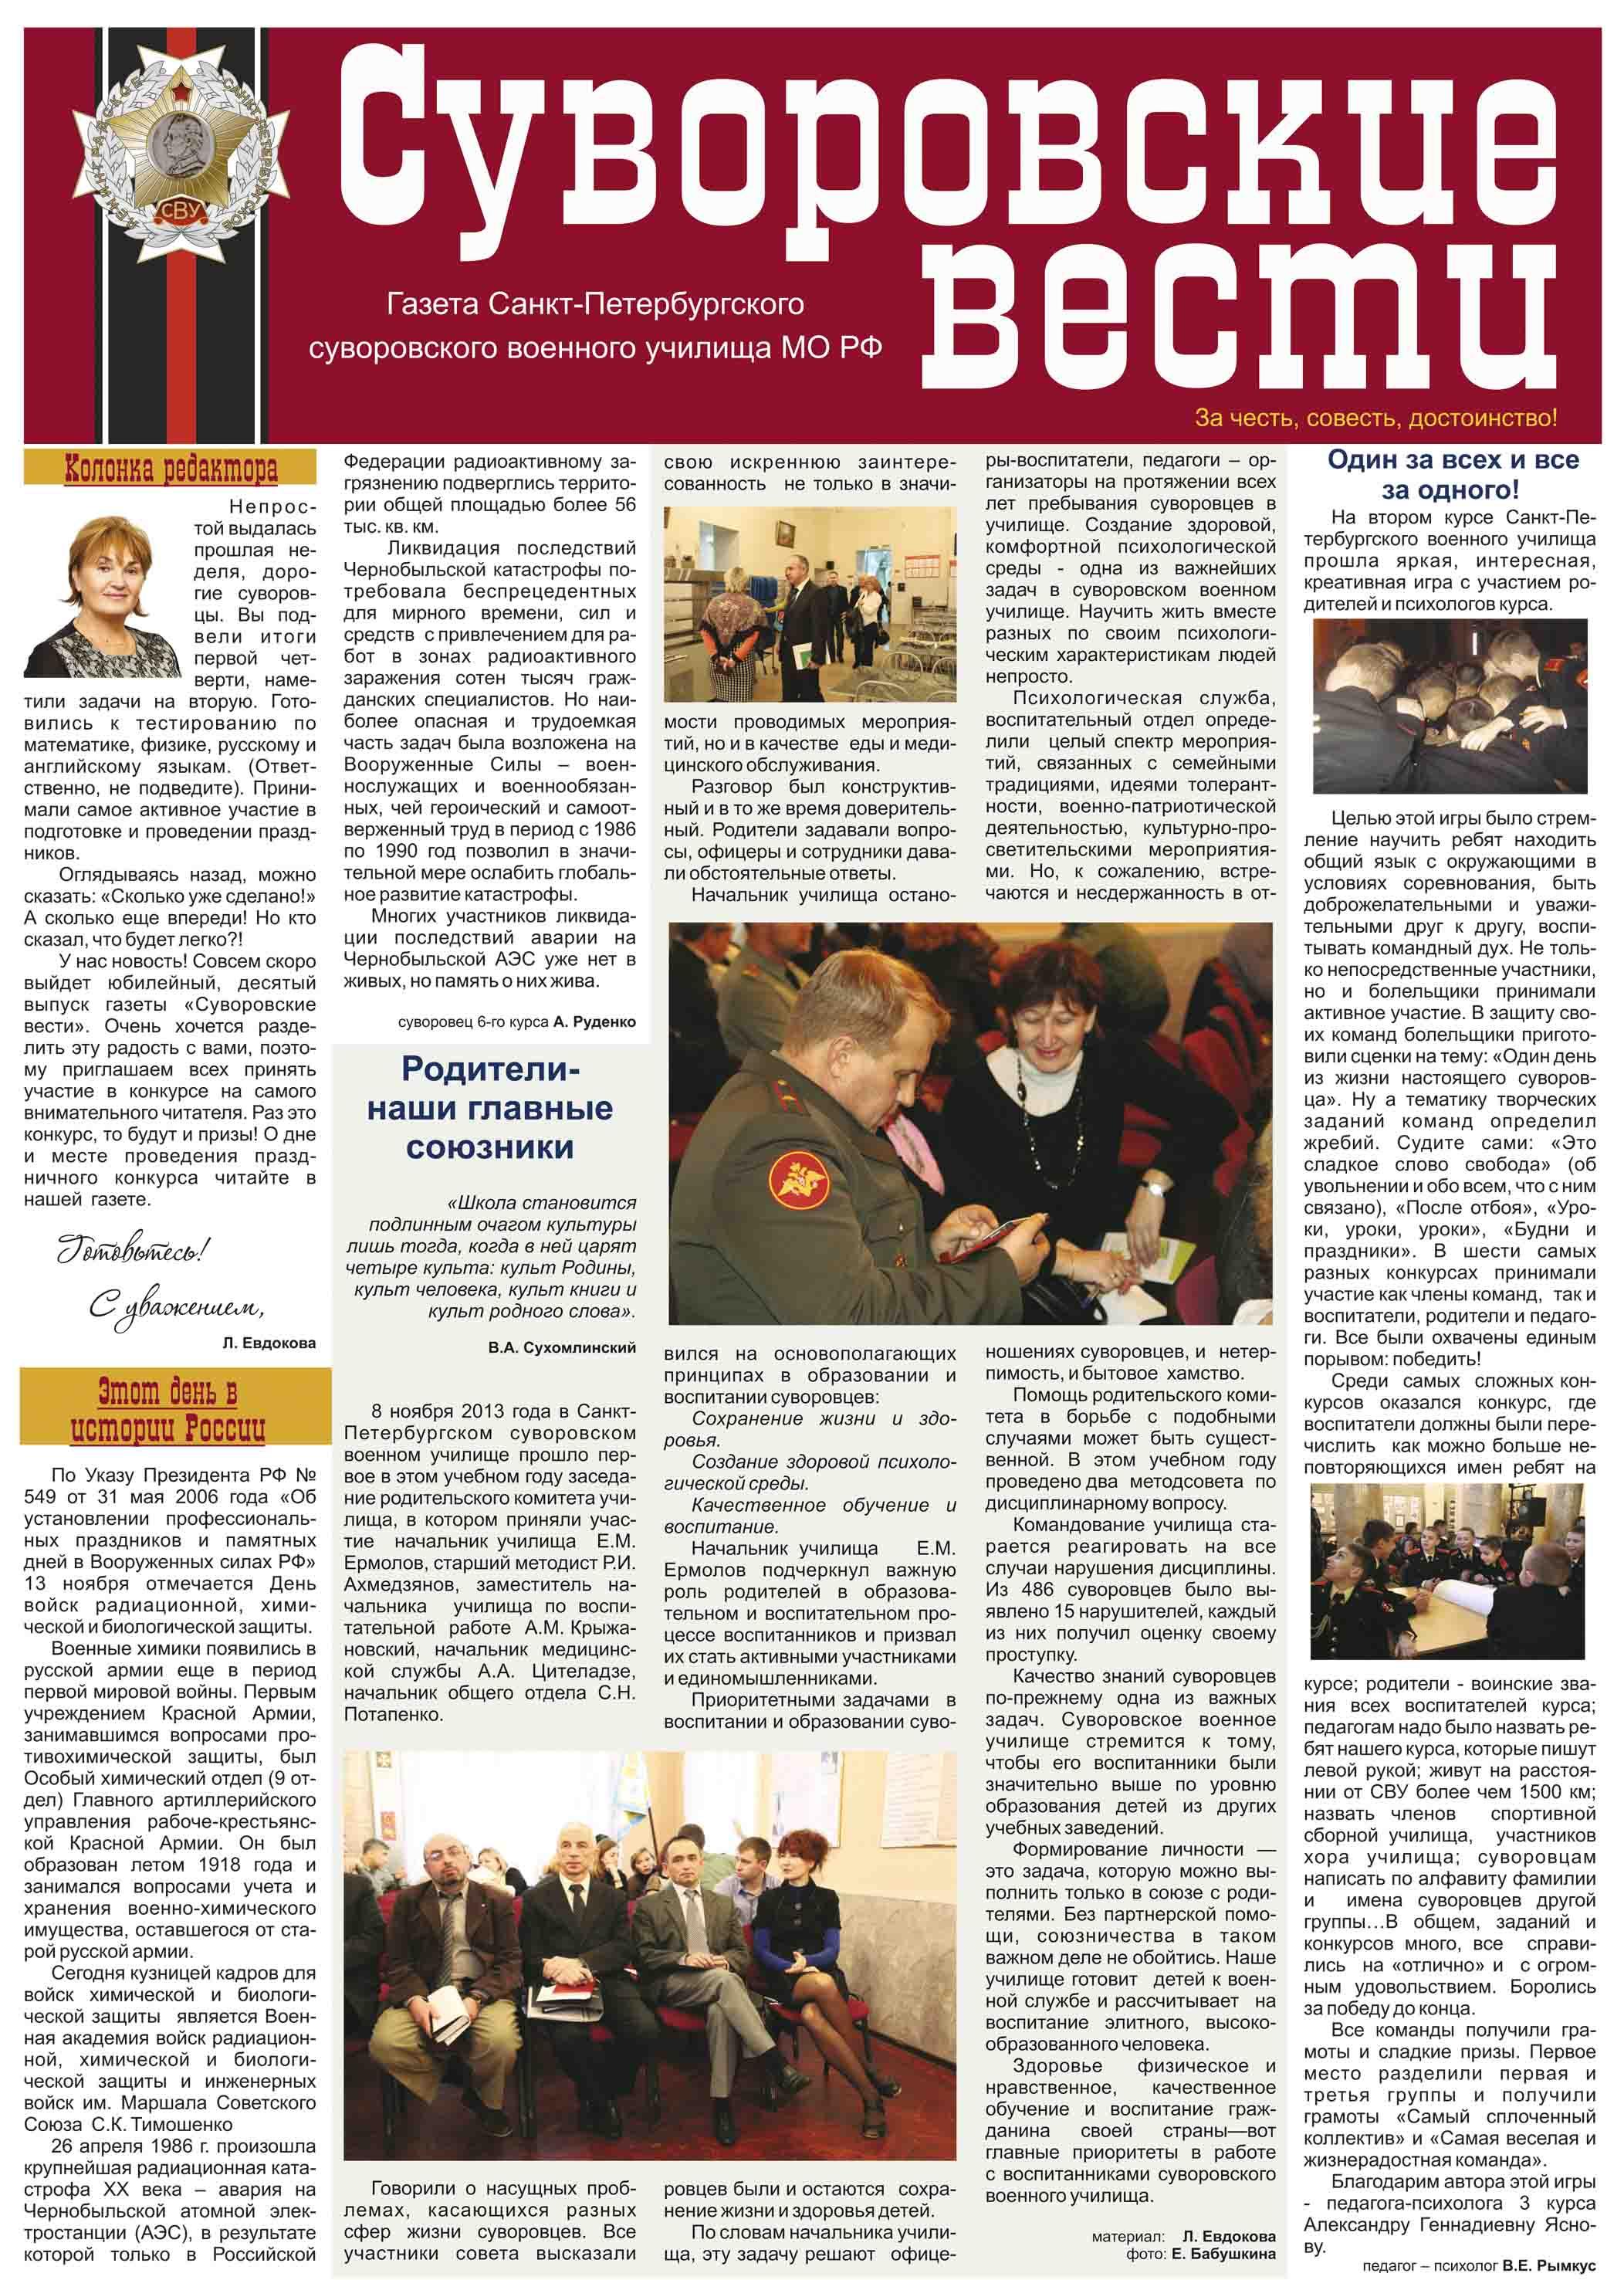 newsPaper_09.cdr